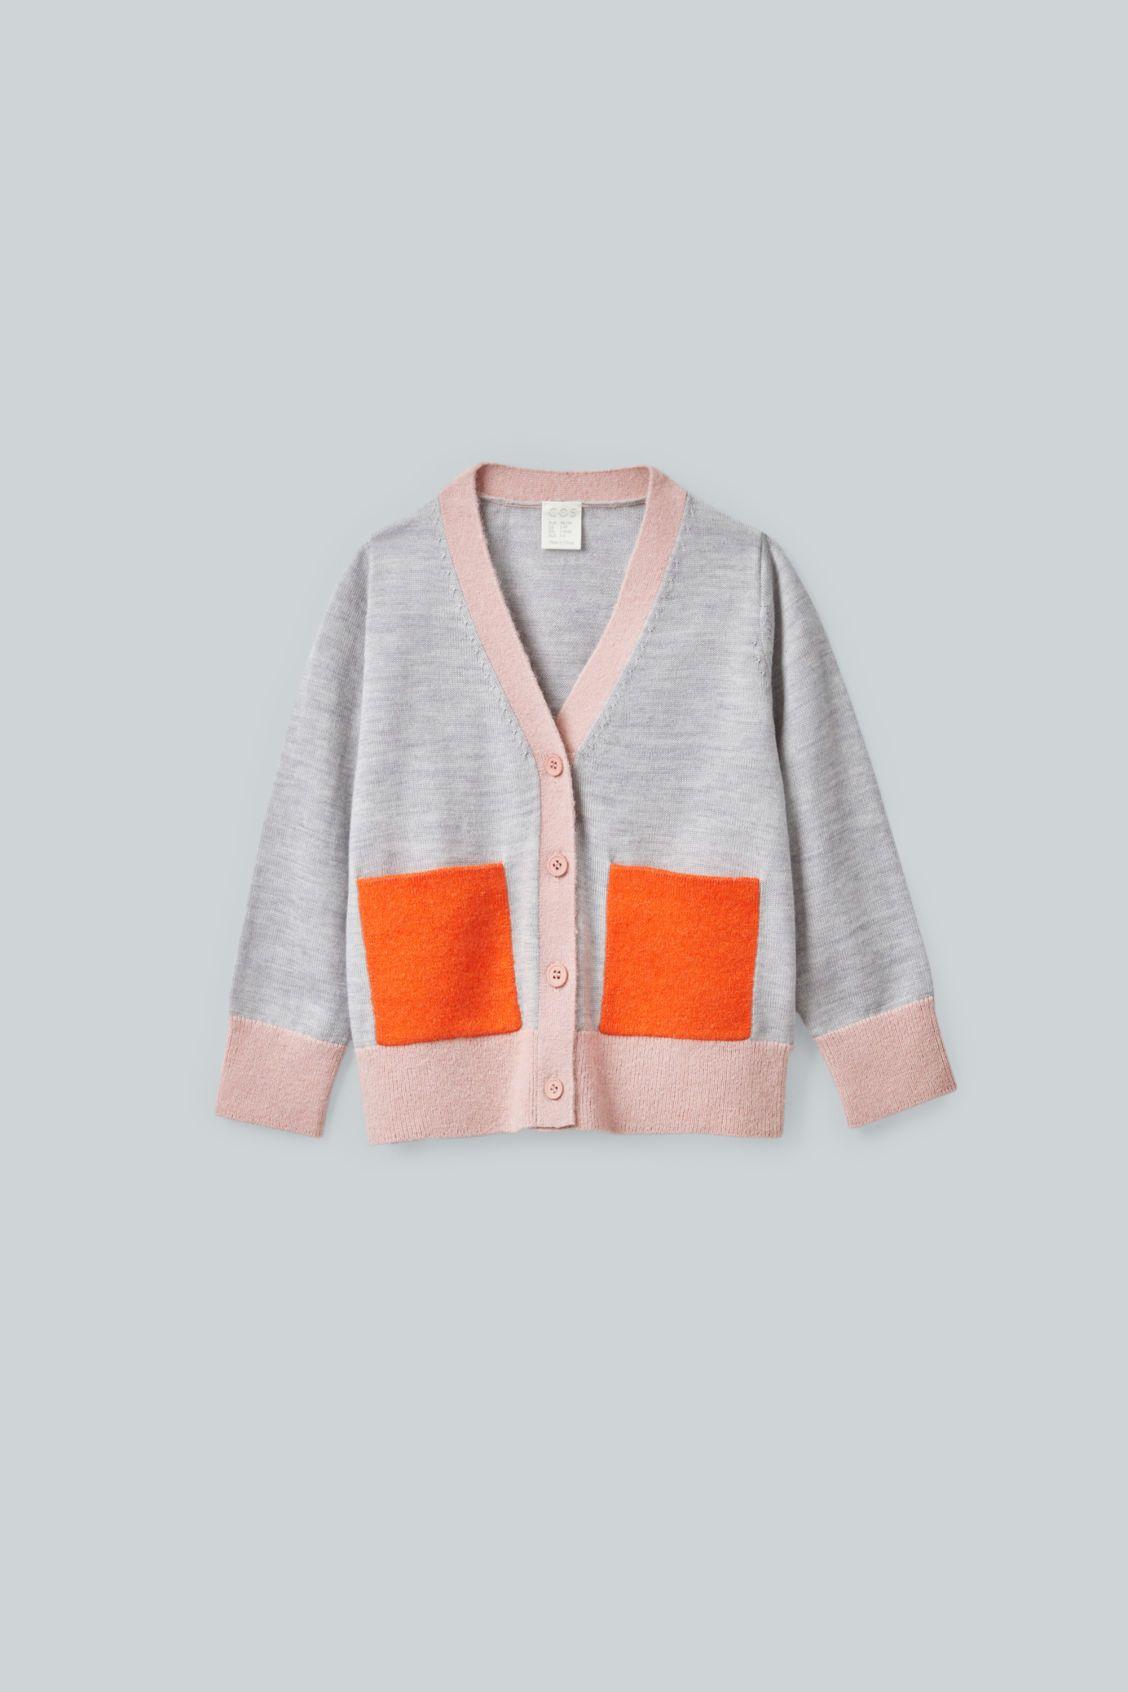 Cos Kids' Colour block Merino Cardigan In Grey | ModeSens